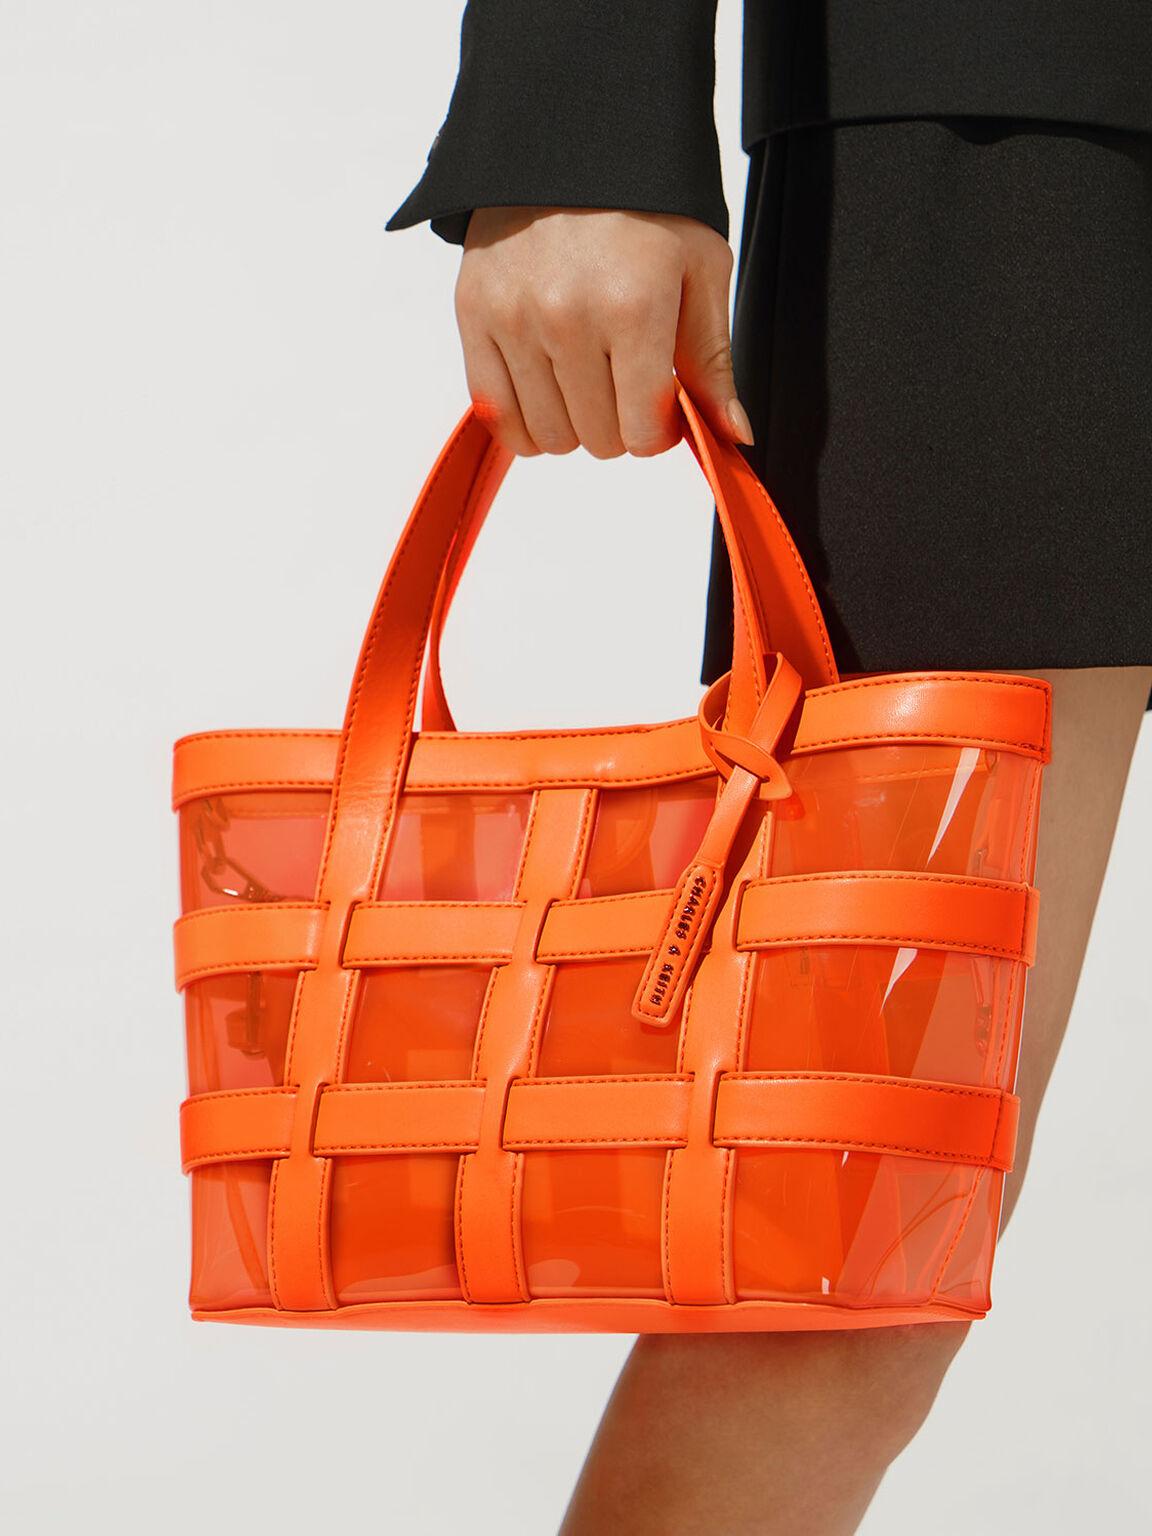 Caged See-Through Tote Bag, Neon Orange, hi-res